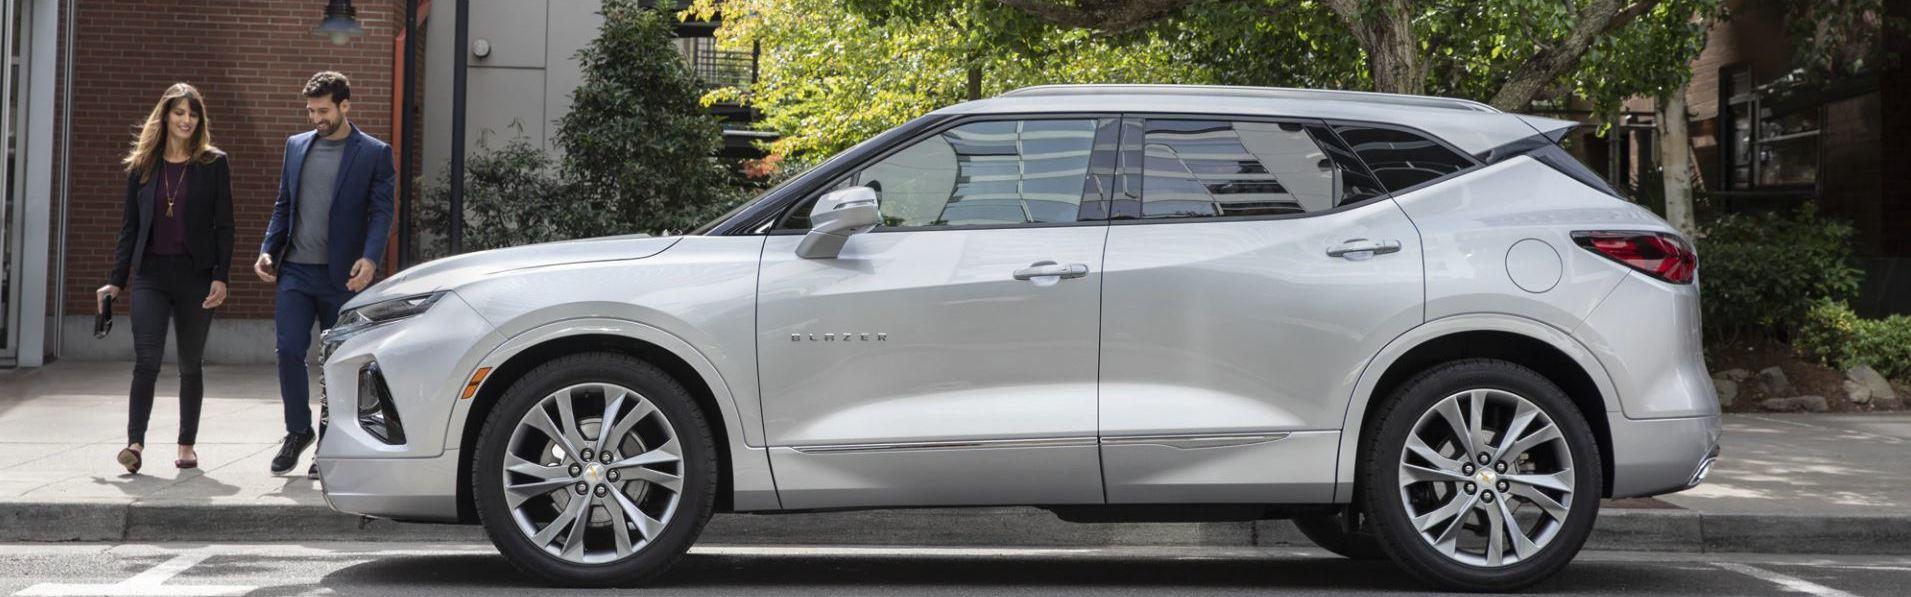 2020 Chevrolet Blazer for Sale near Downers Grove, IL